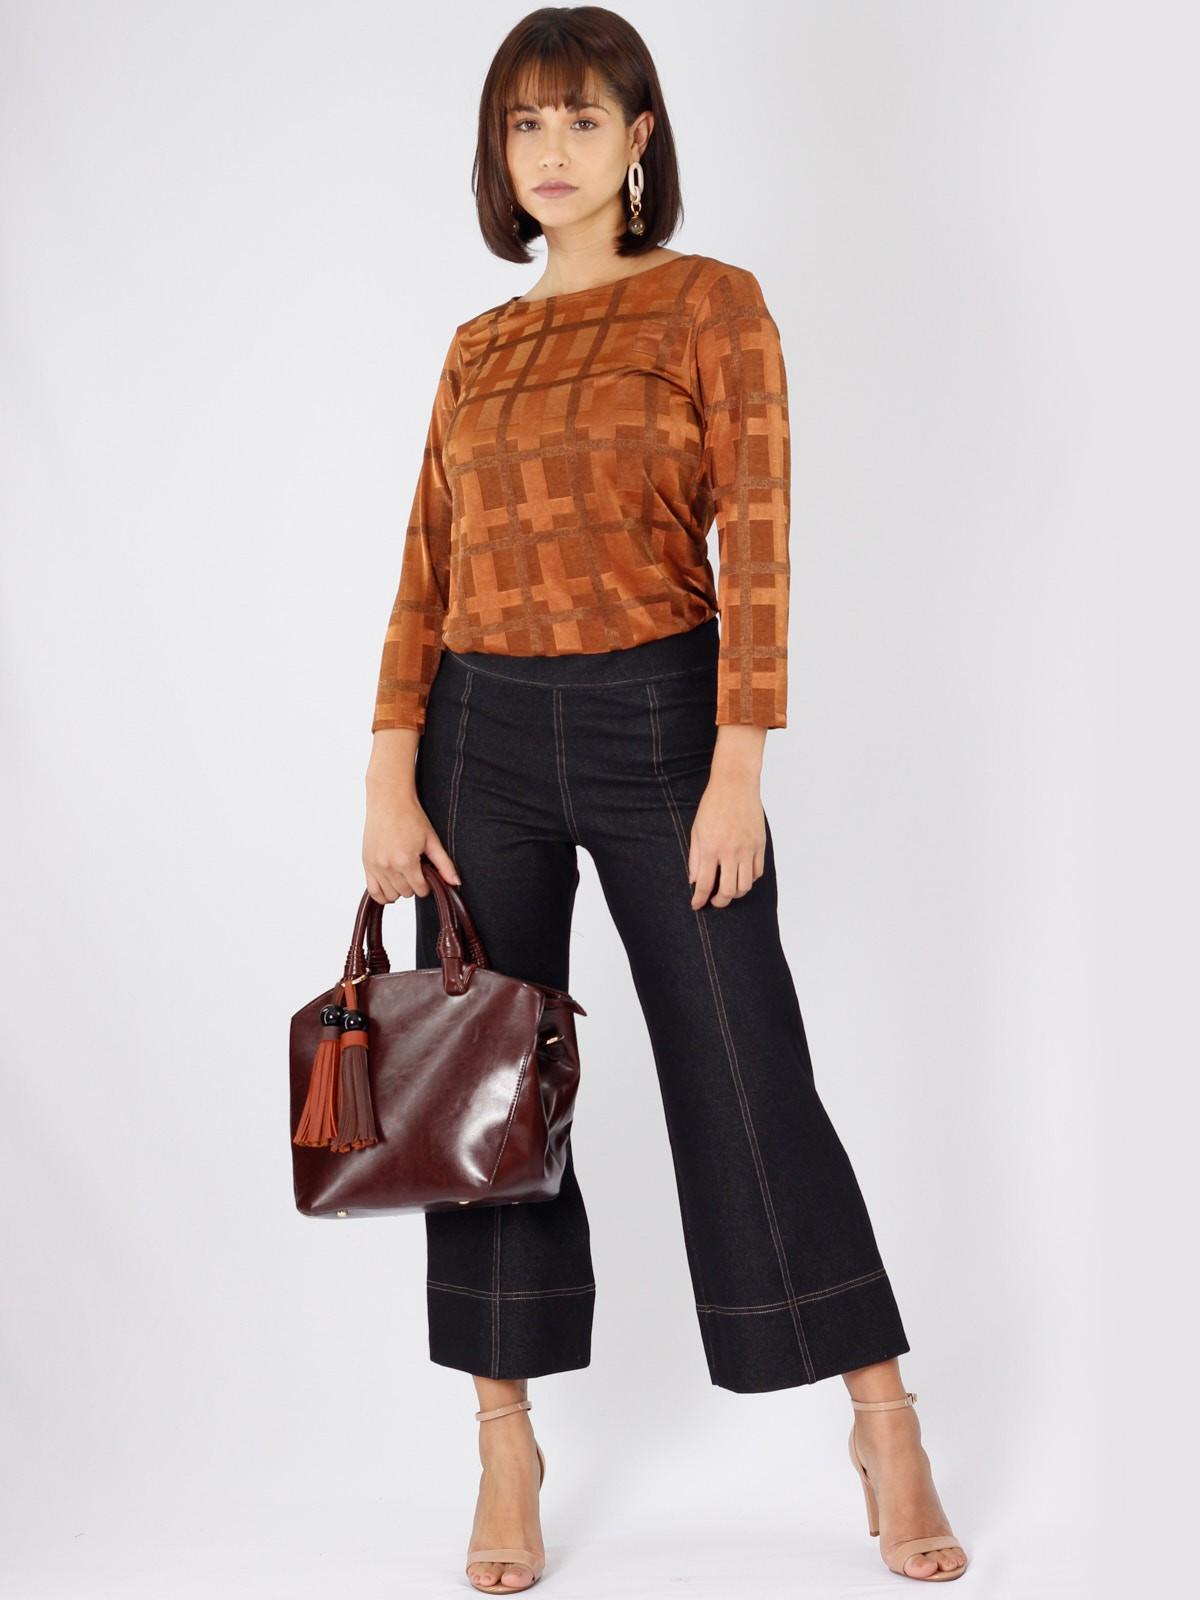 Calça Pantacourt Jeans de Malha